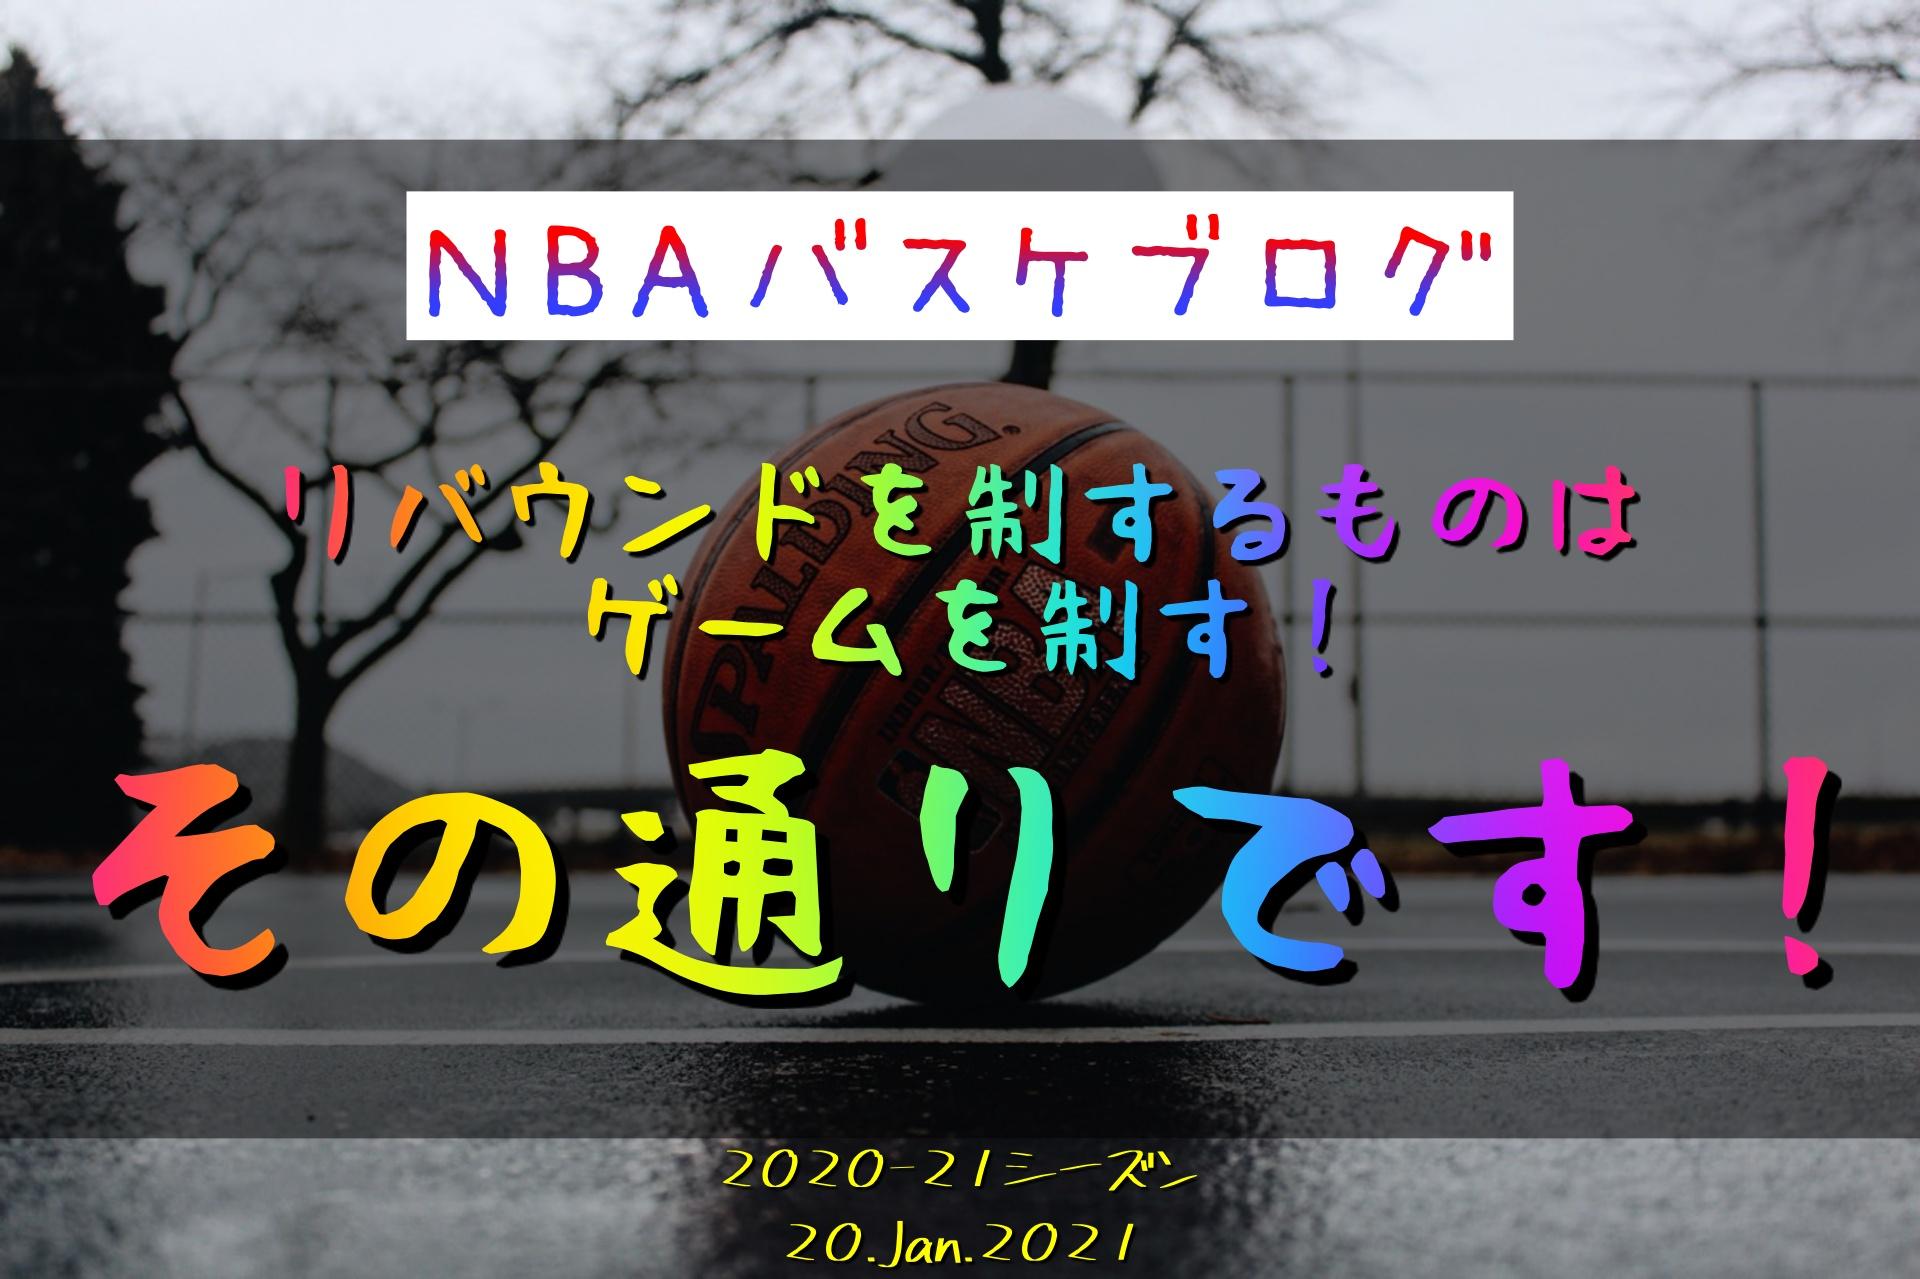 Nba 今日 の NBA,NBA直播,专业的NBA中文网站_网易体育